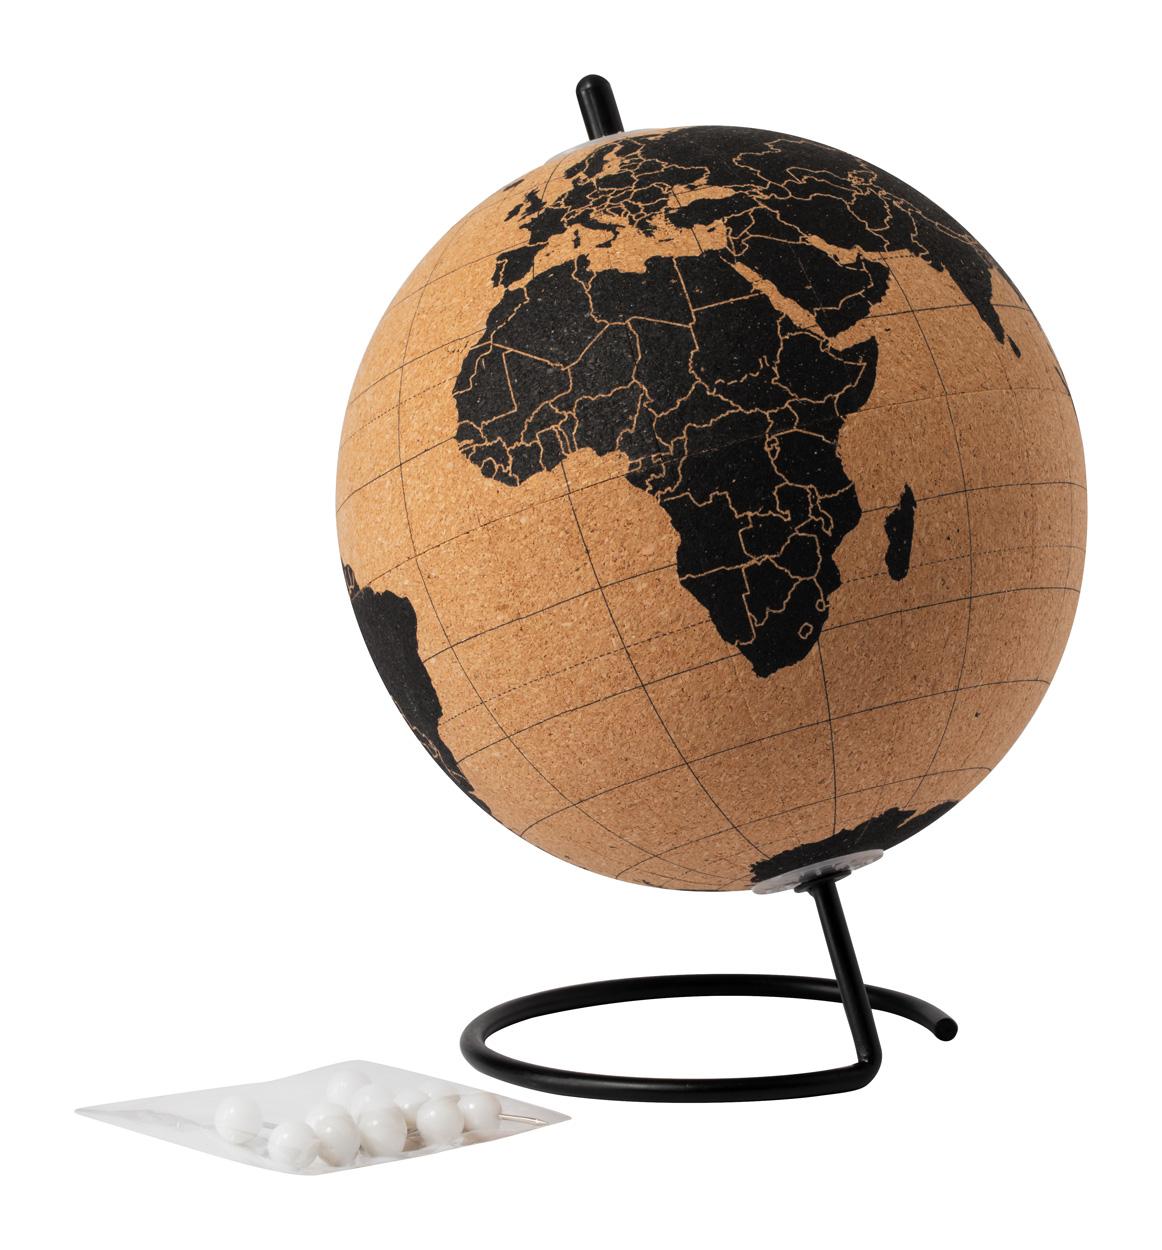 Munds globe